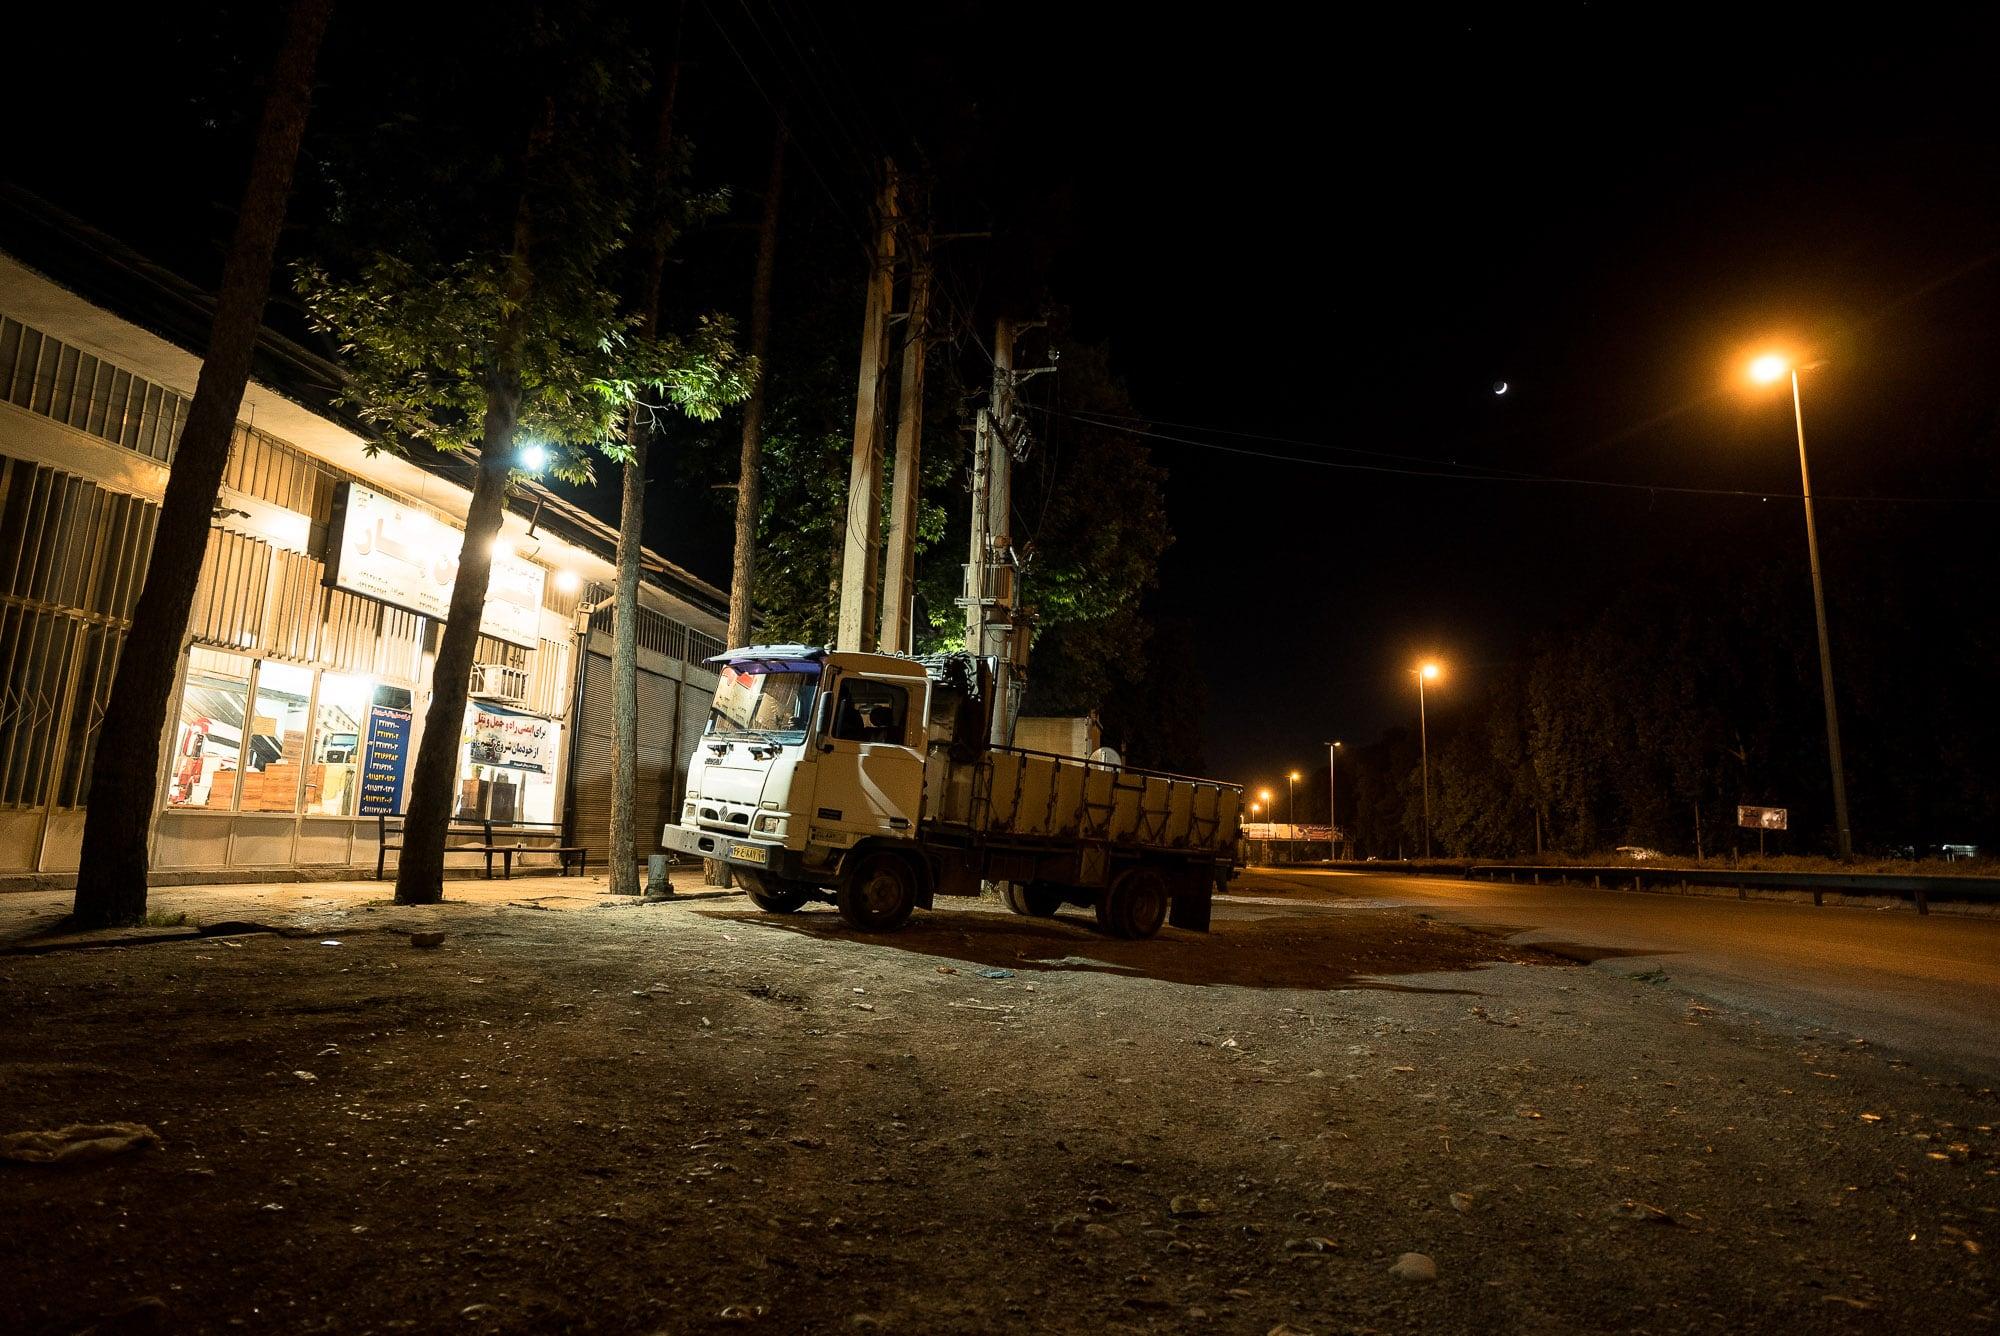 entering Gorgan at night